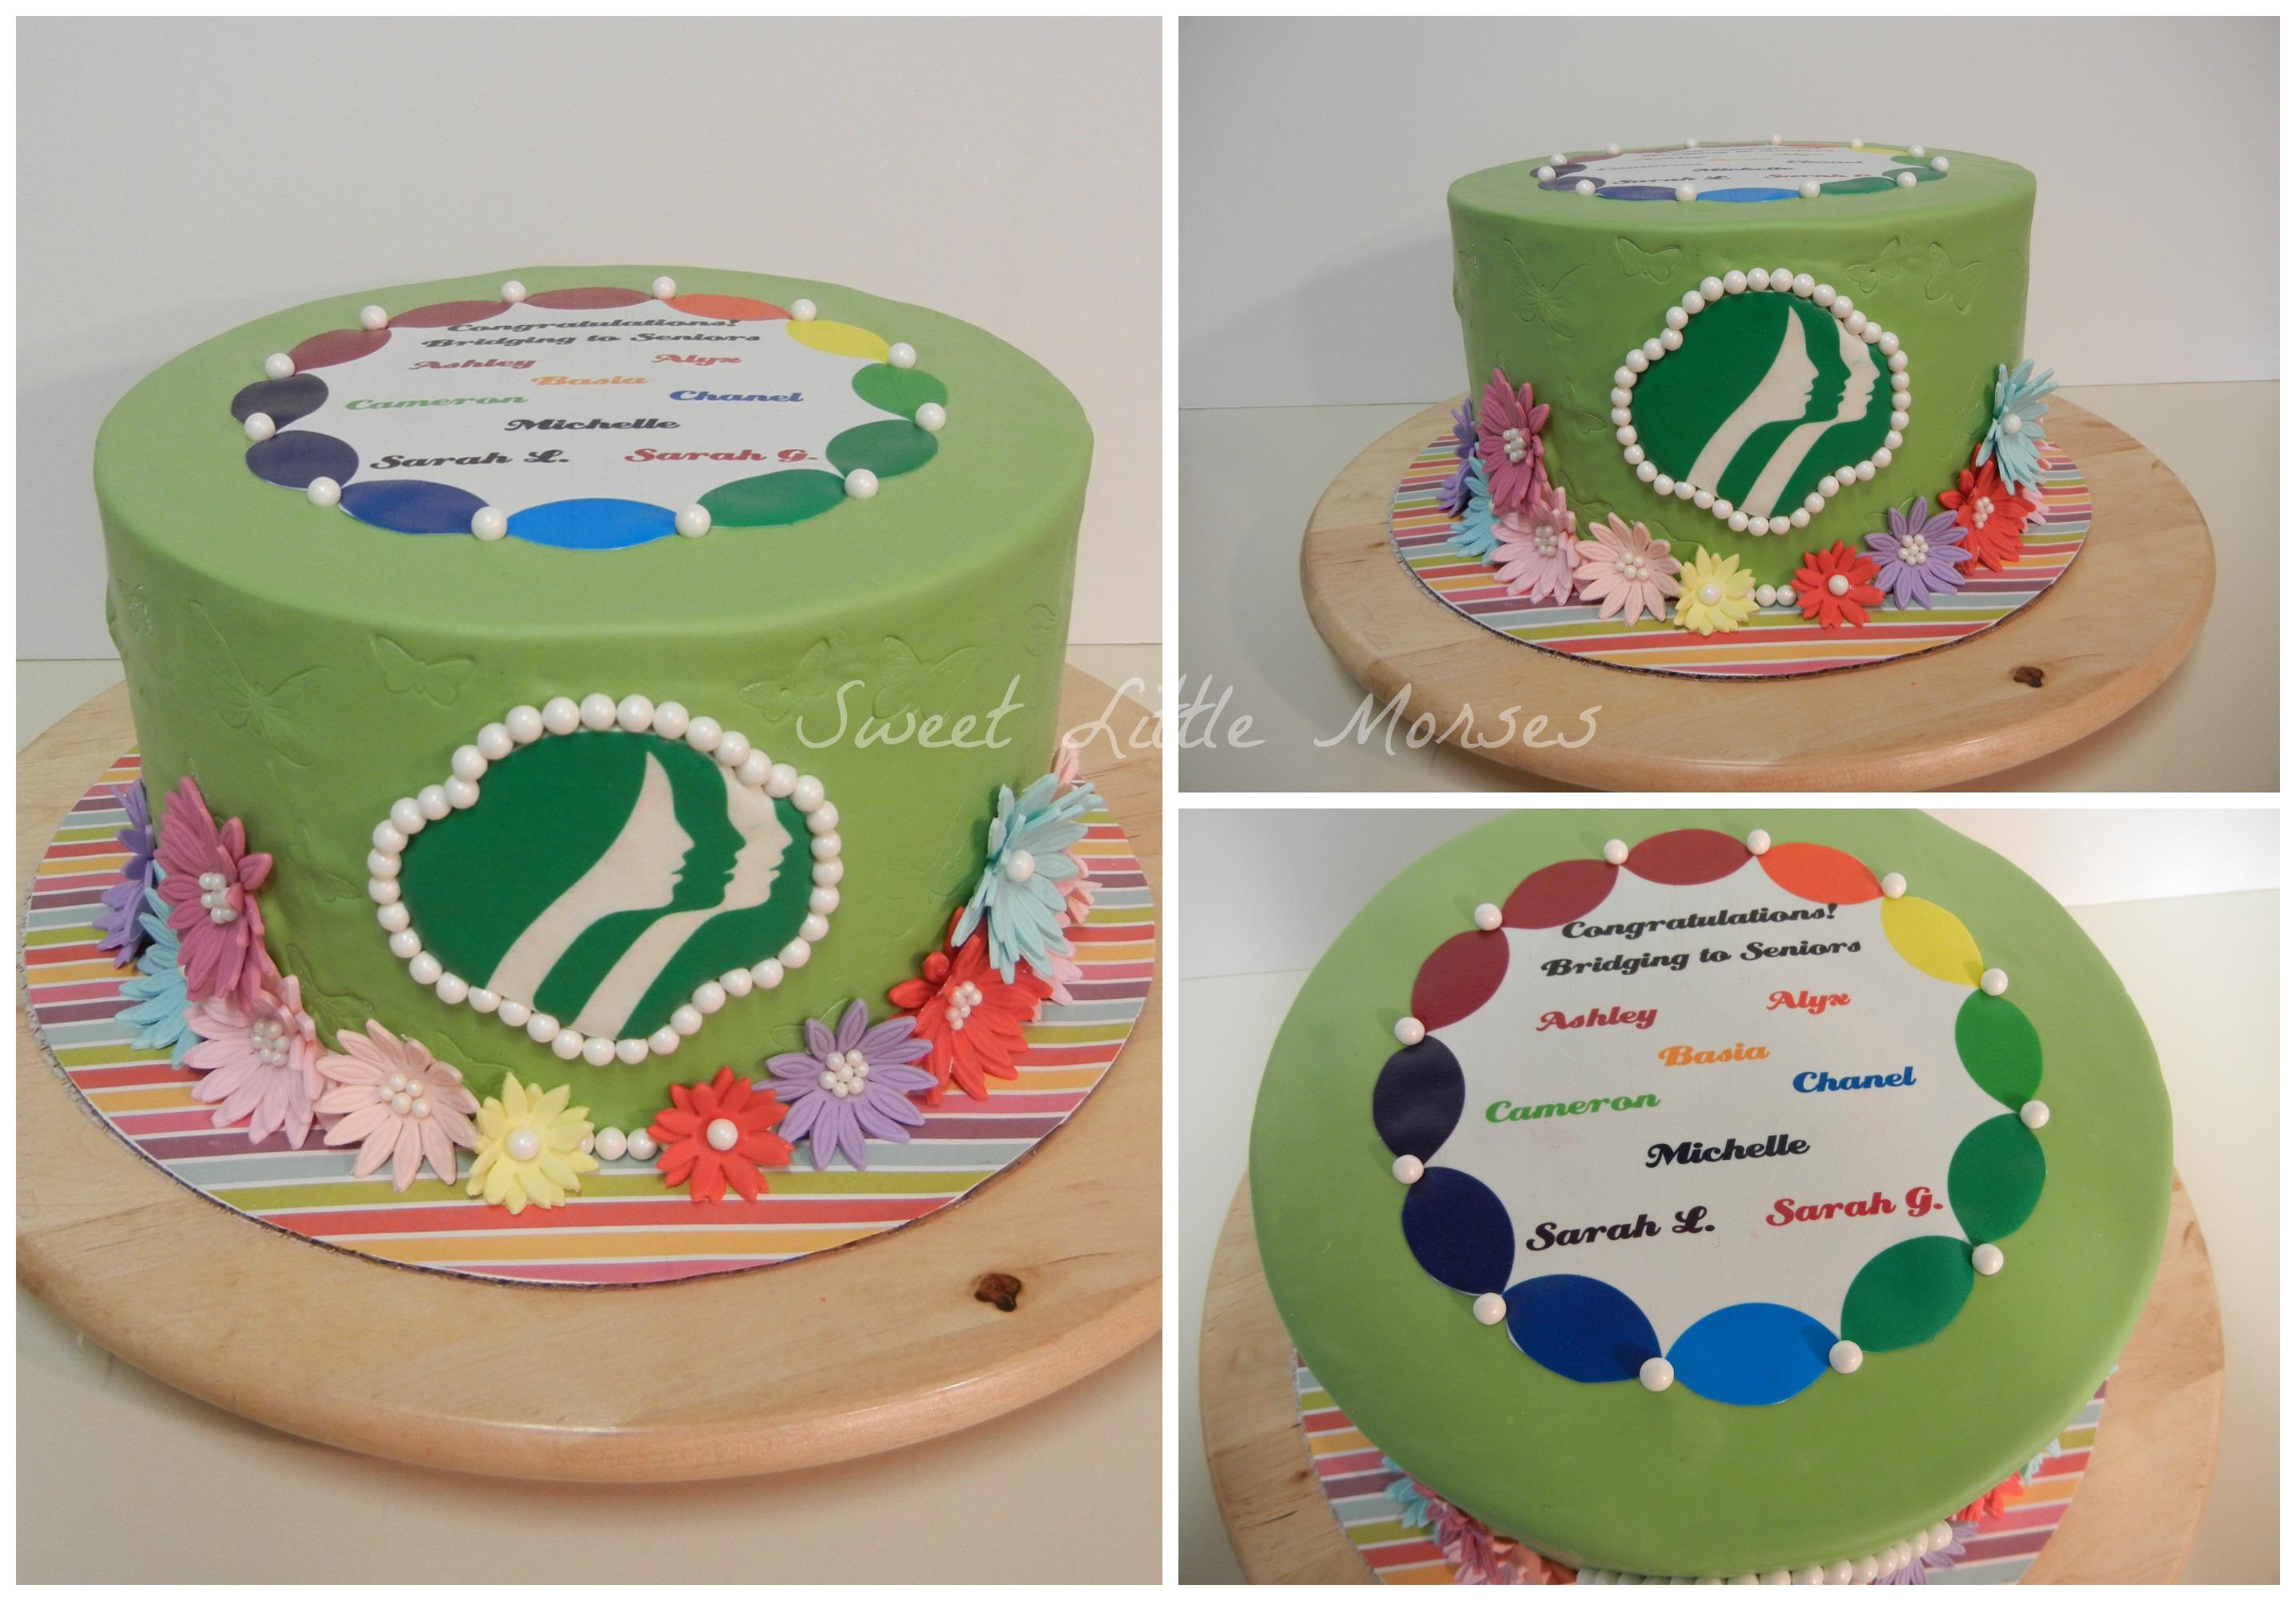 Cake Ideas For Girl Scouts : Sweet Little Morsels, LLC